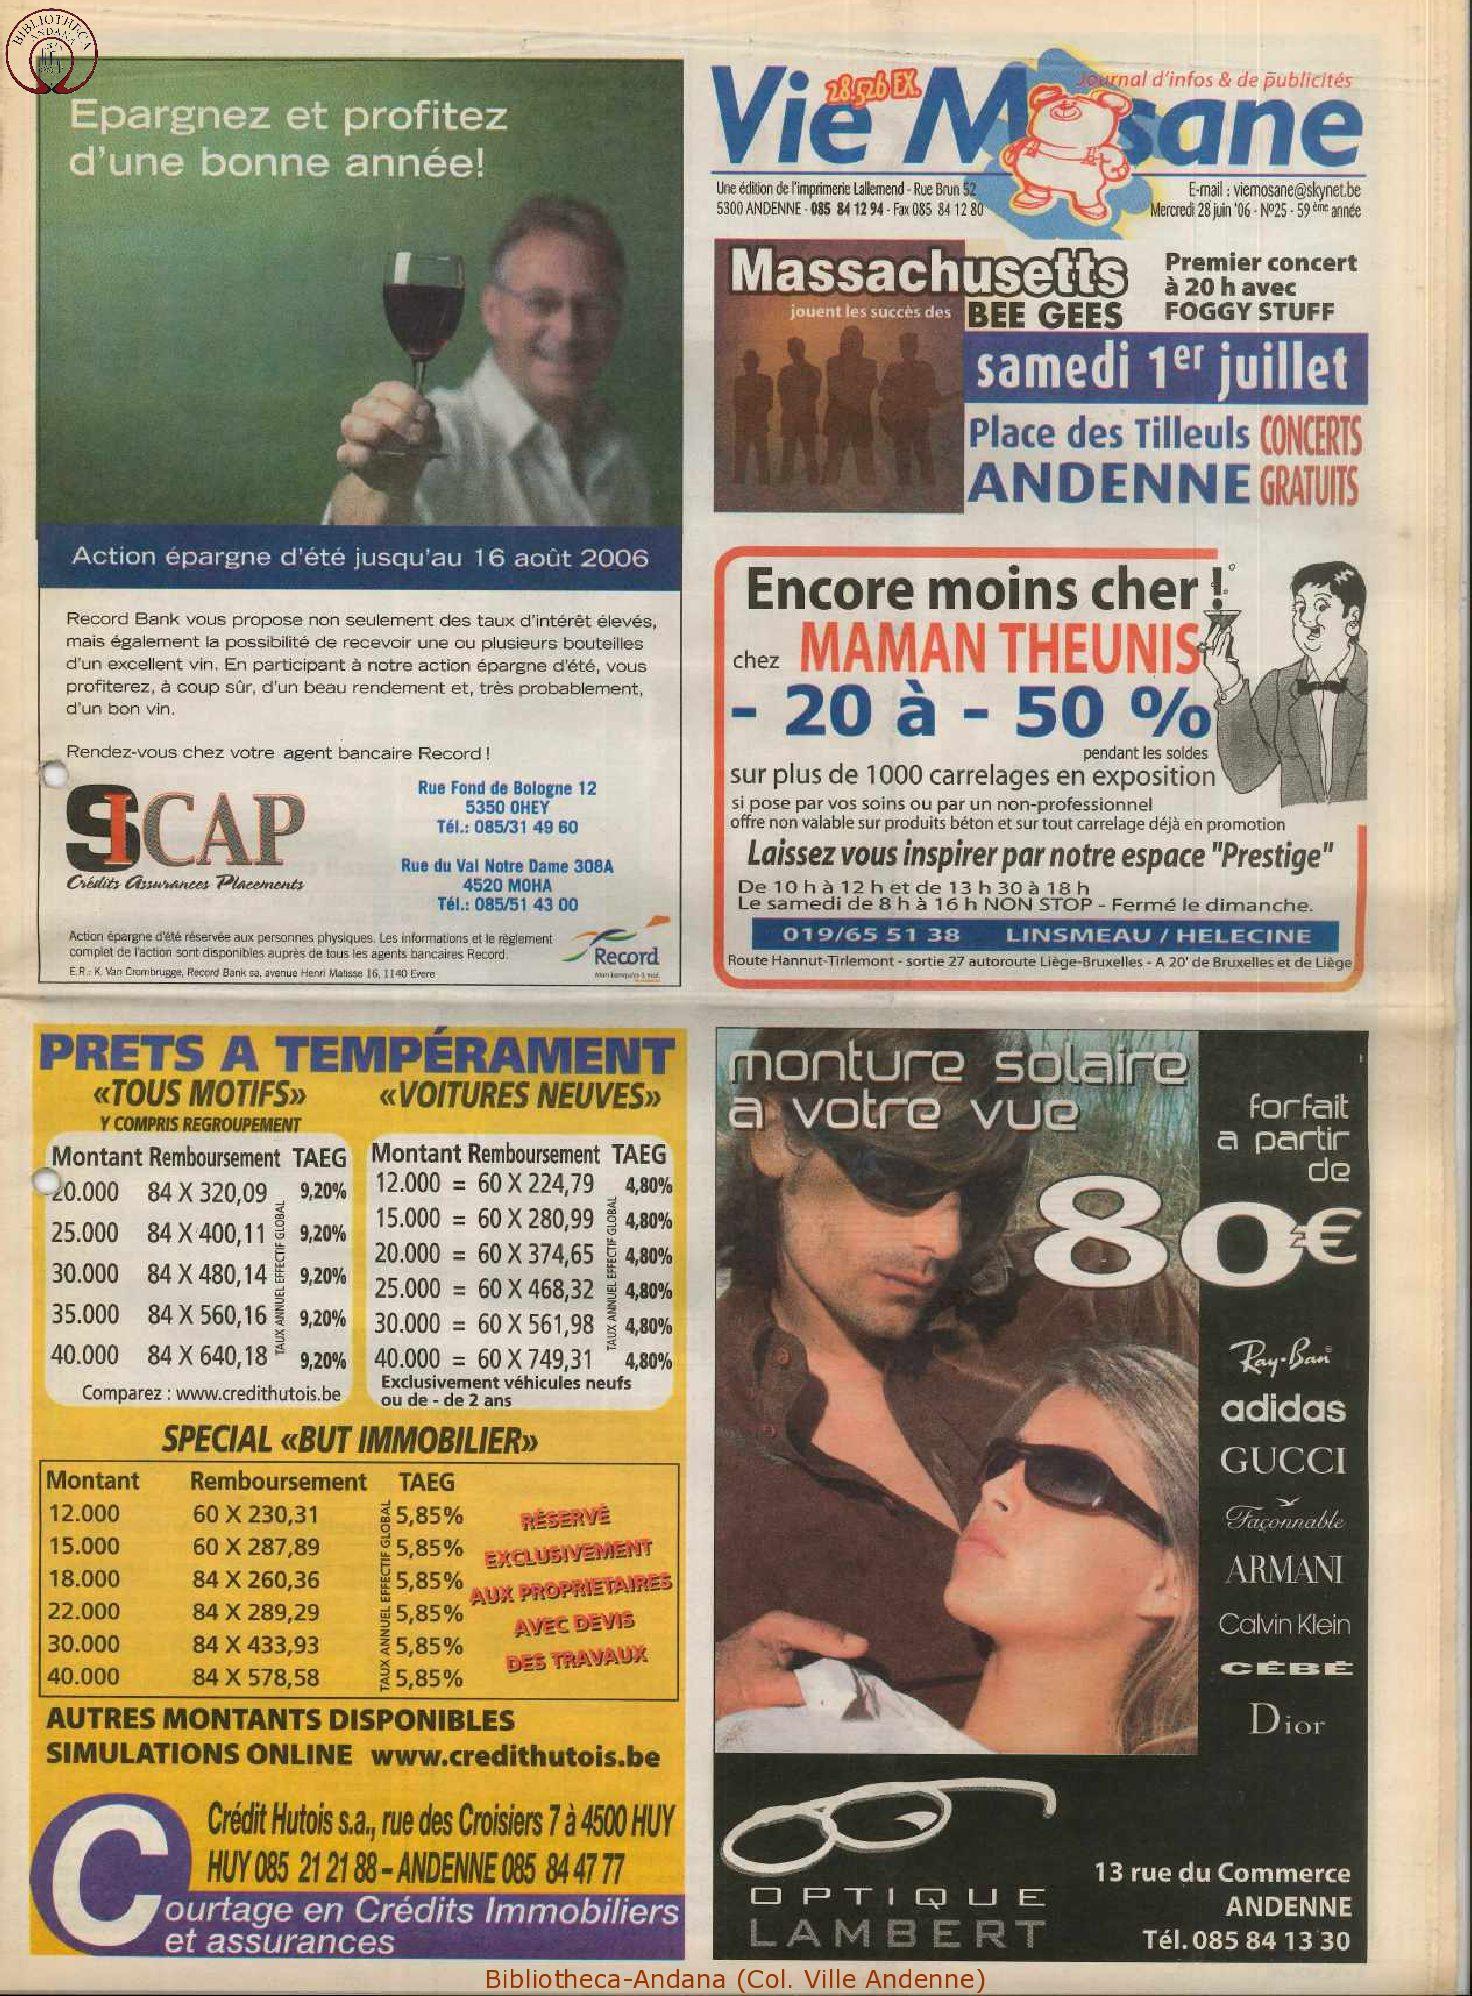 59e année - n°25 - 28 juin 2006